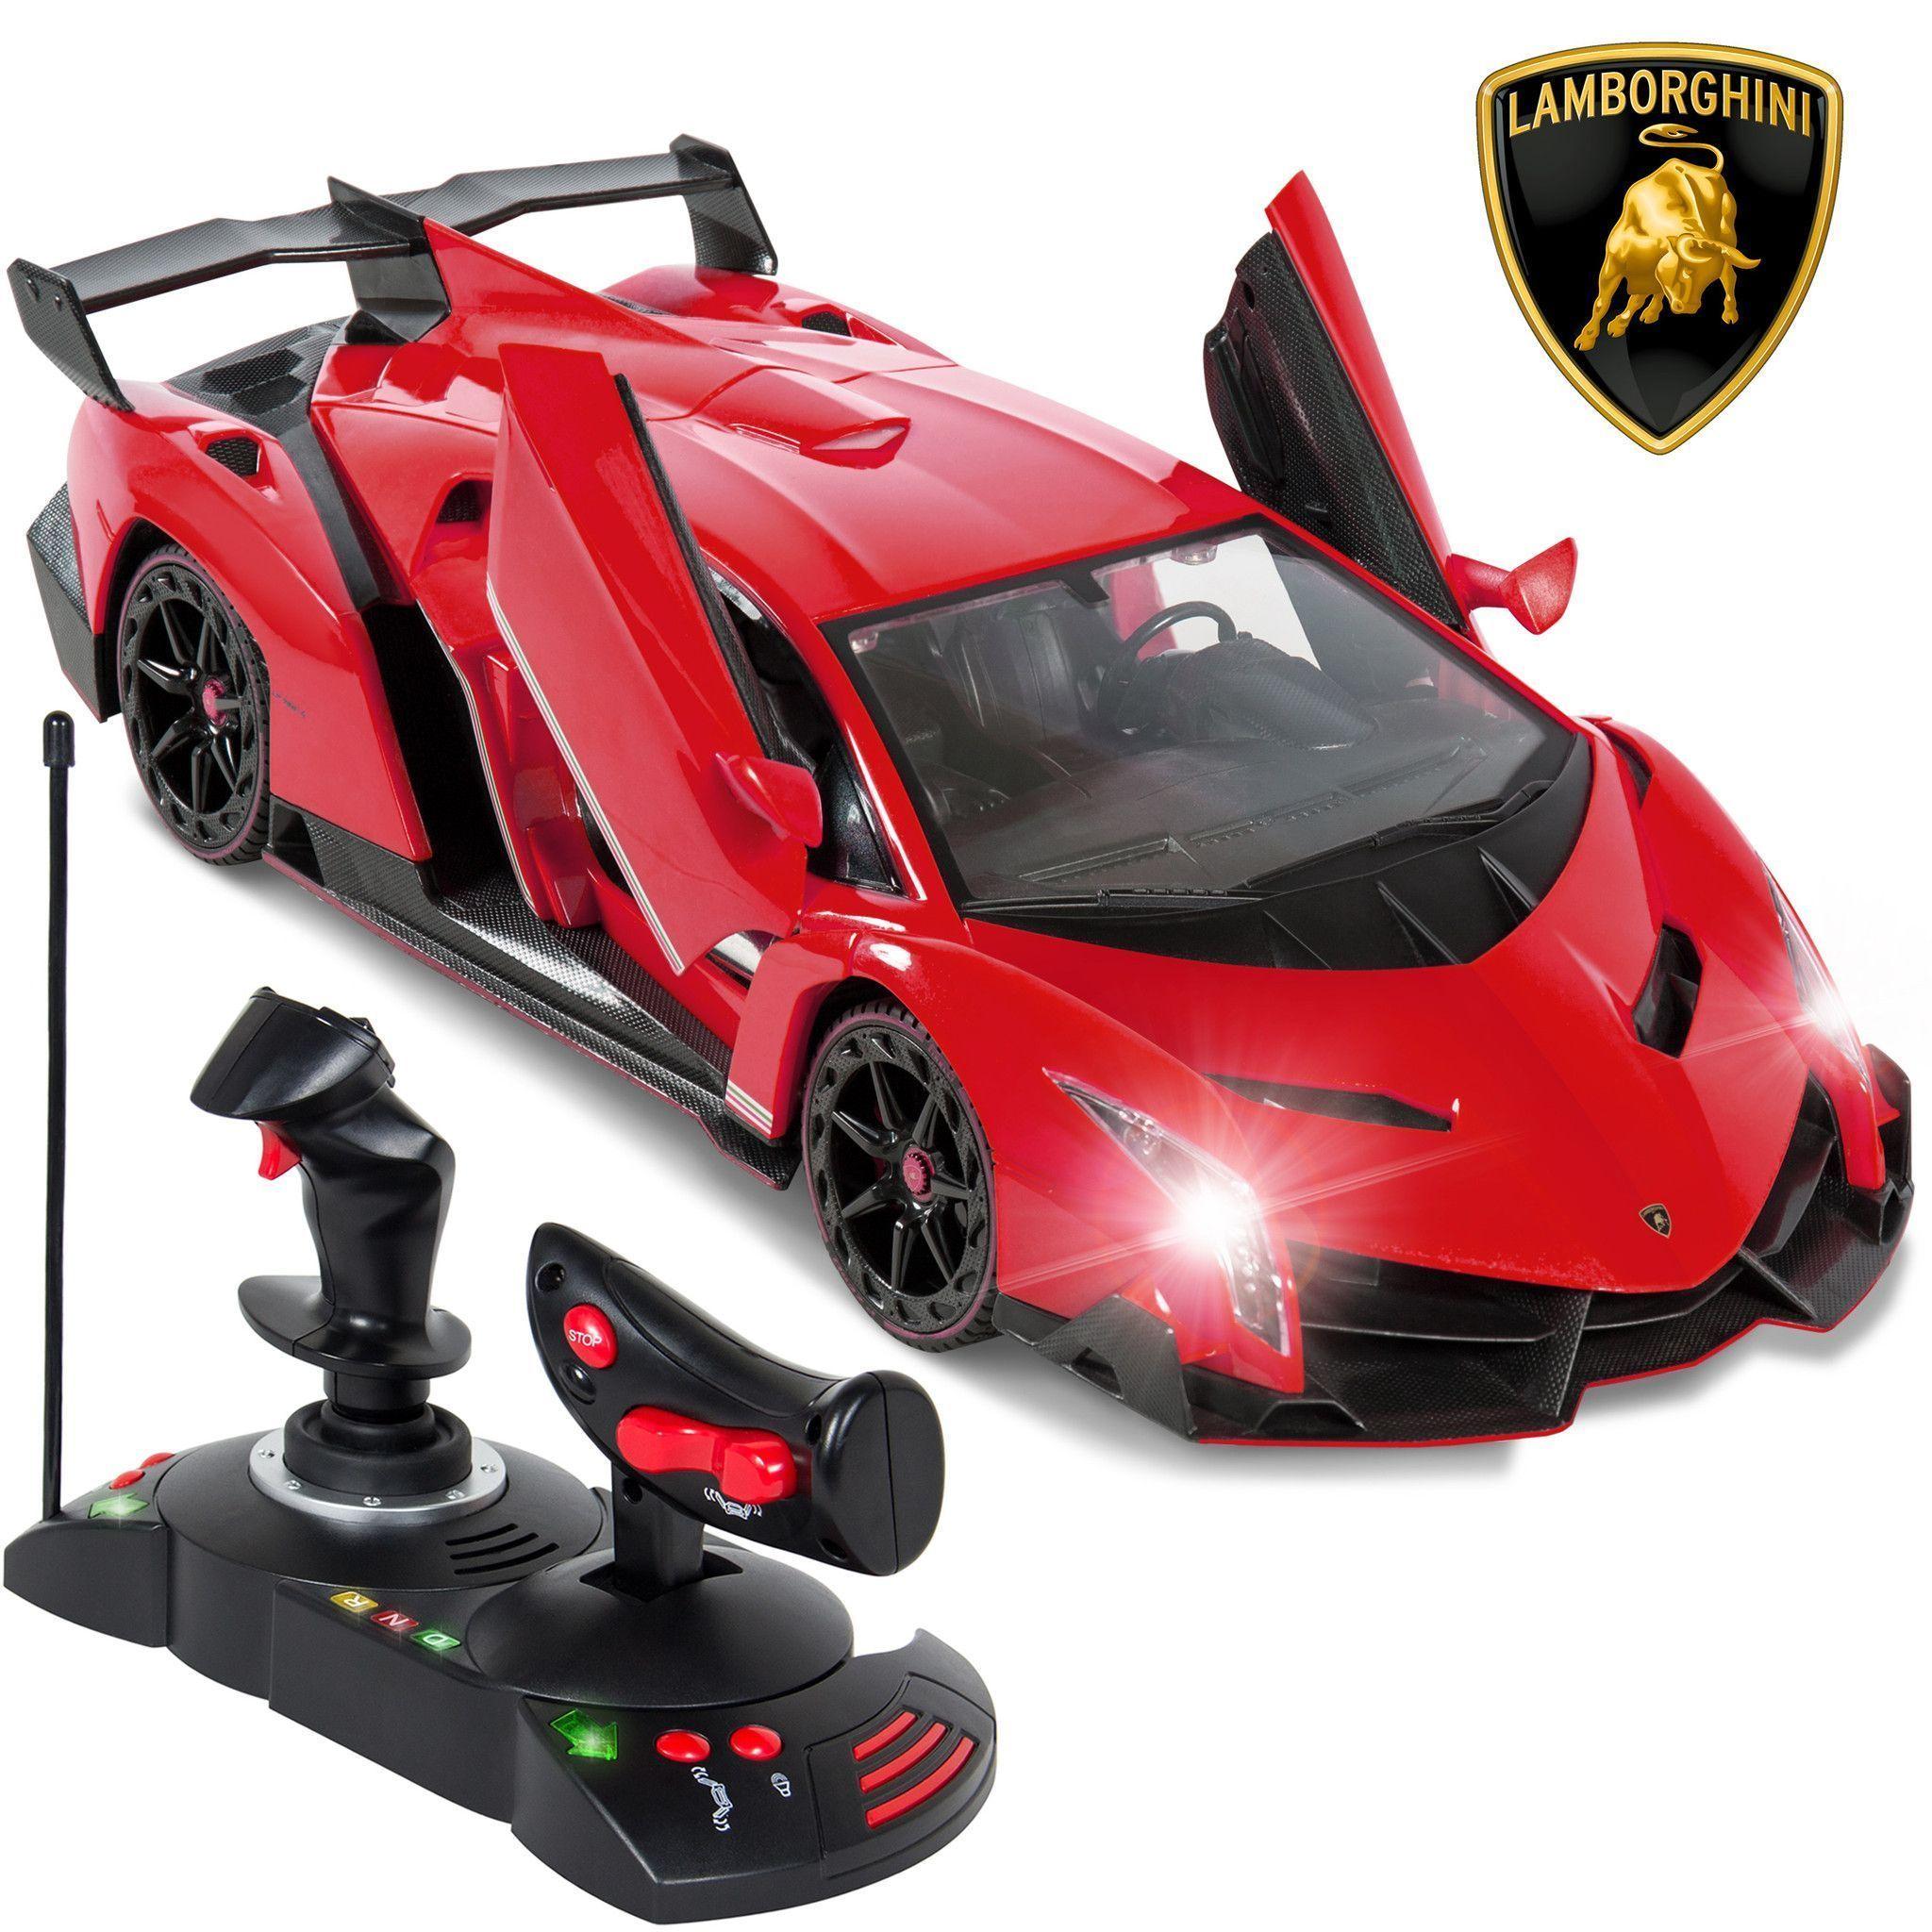 Best Choice Products 1/14 Scale RC Lamborghini Veneno